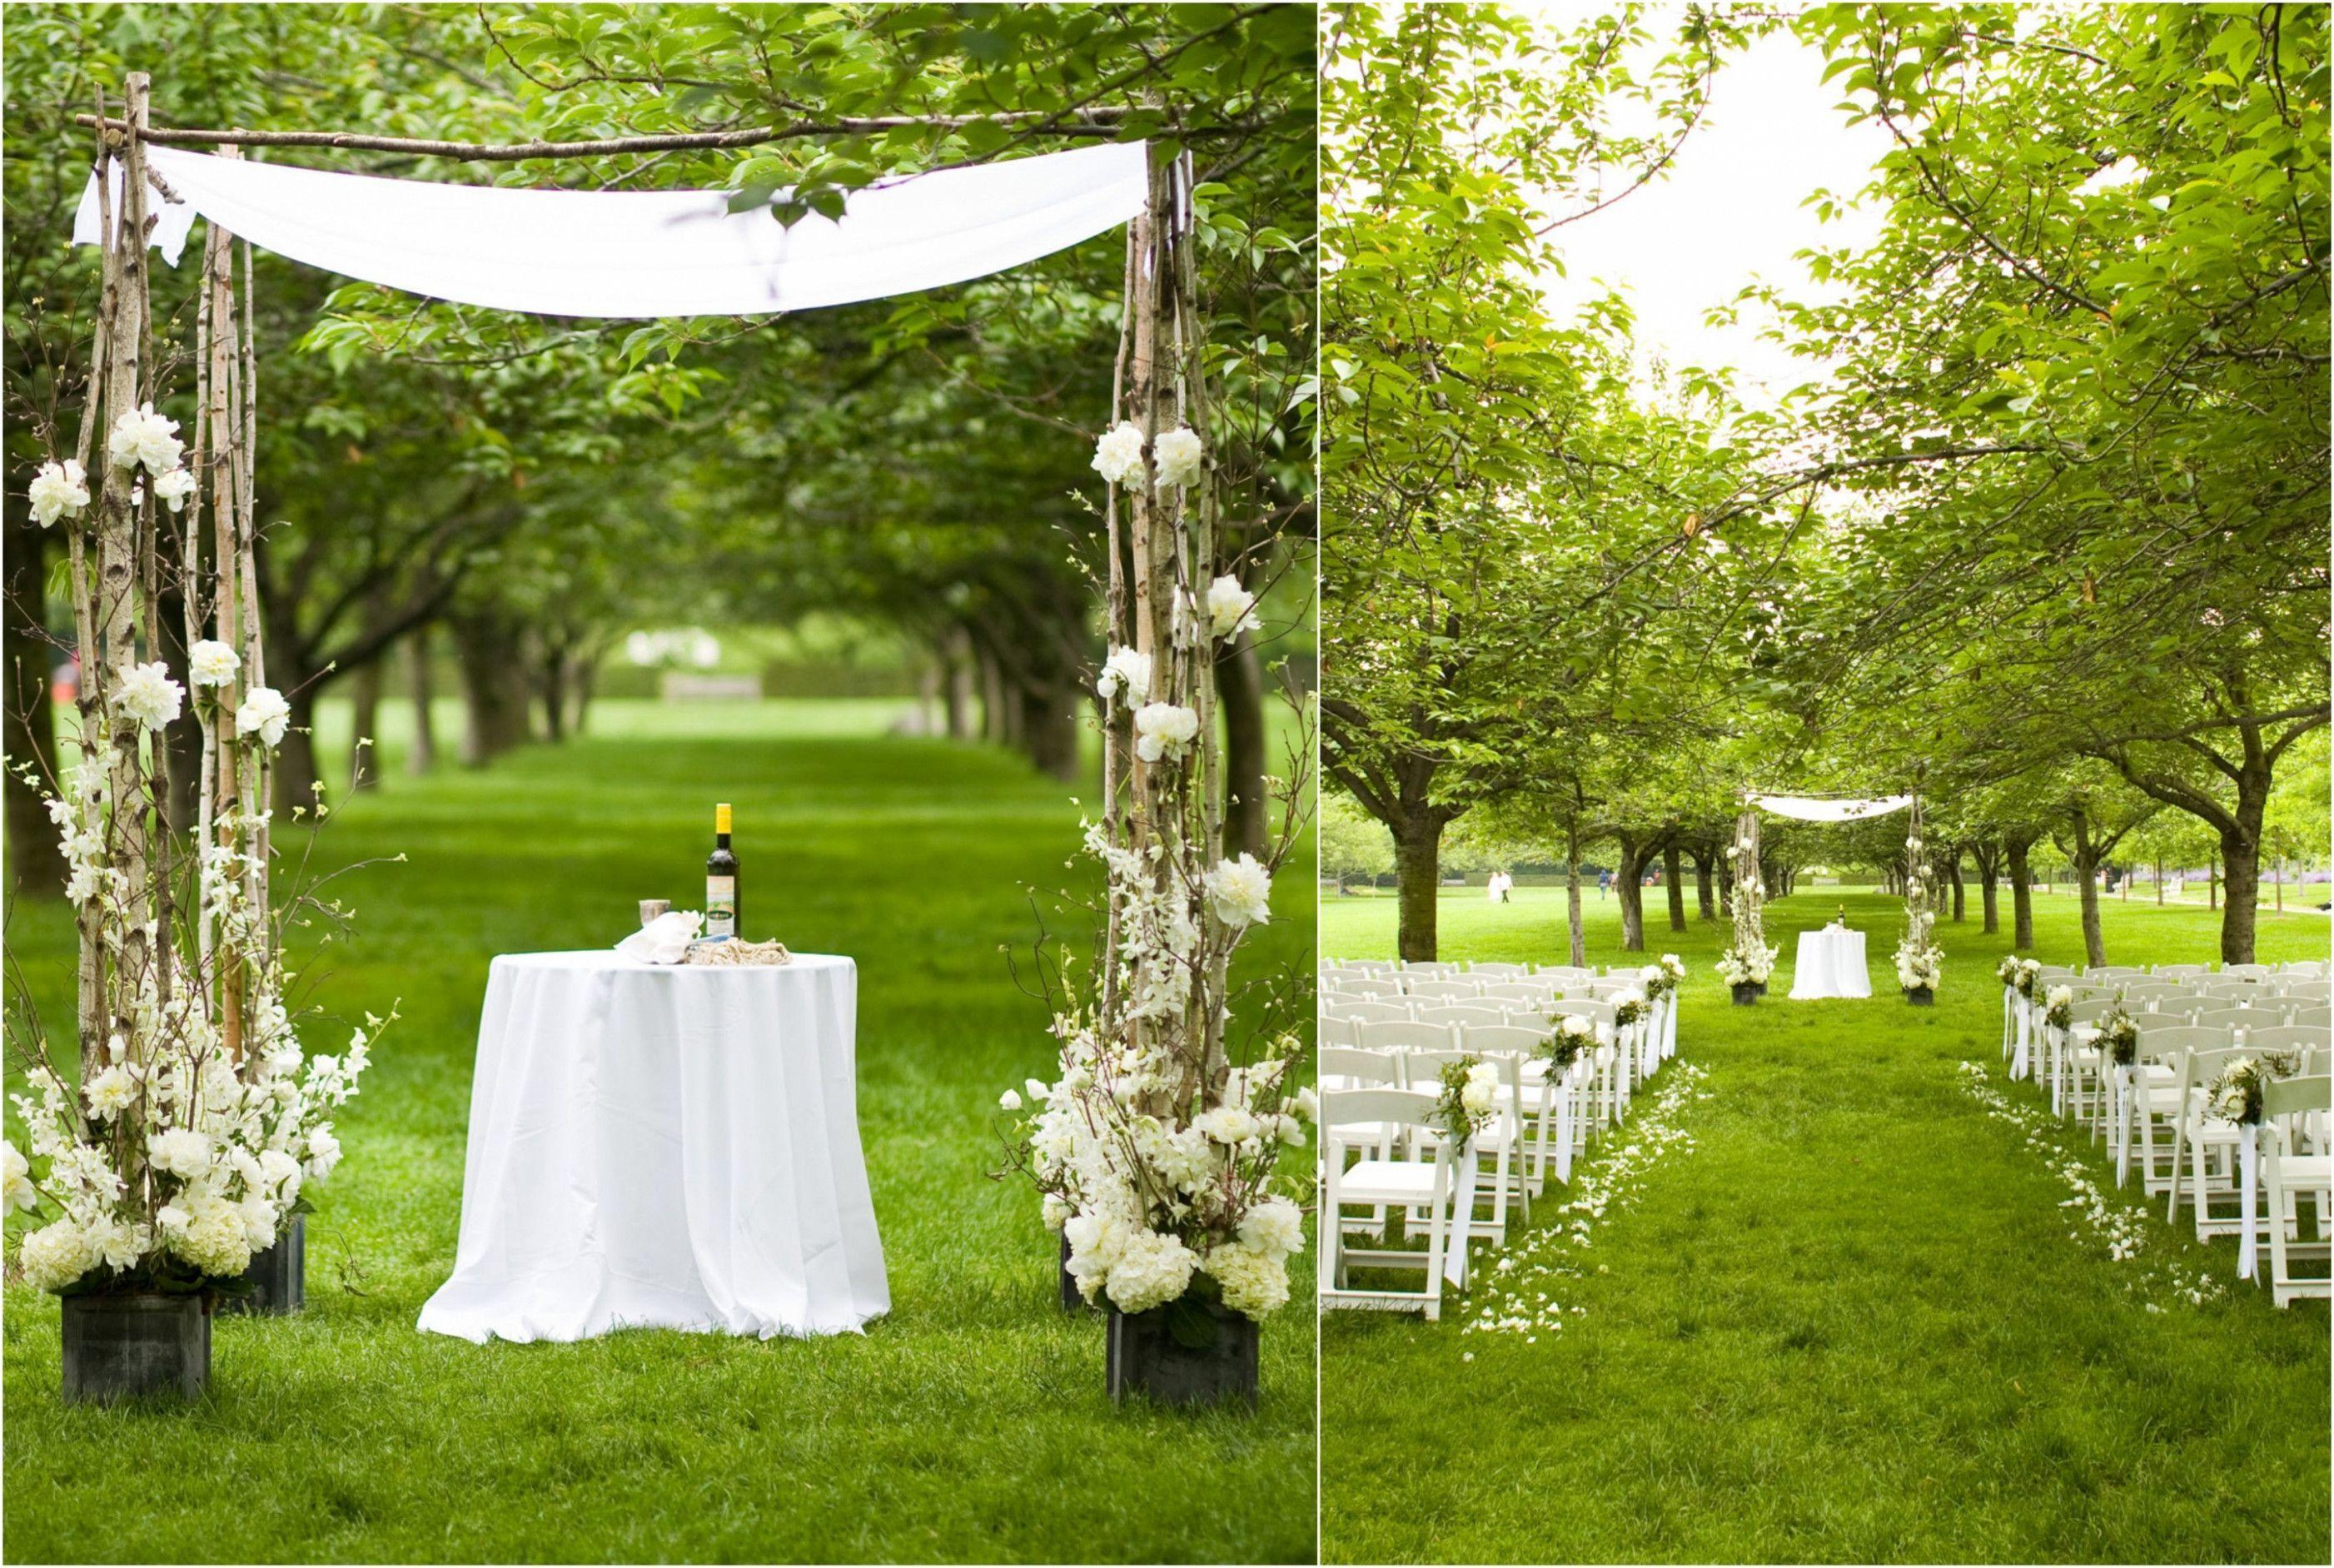 Wedding Ceremony Decorations Geekleetist Cheap Wedding Beach Weddin In 2020 Wedding Ceremony Decorations Outdoor Cheap Wedding Reception Wedding Themes Outdoor